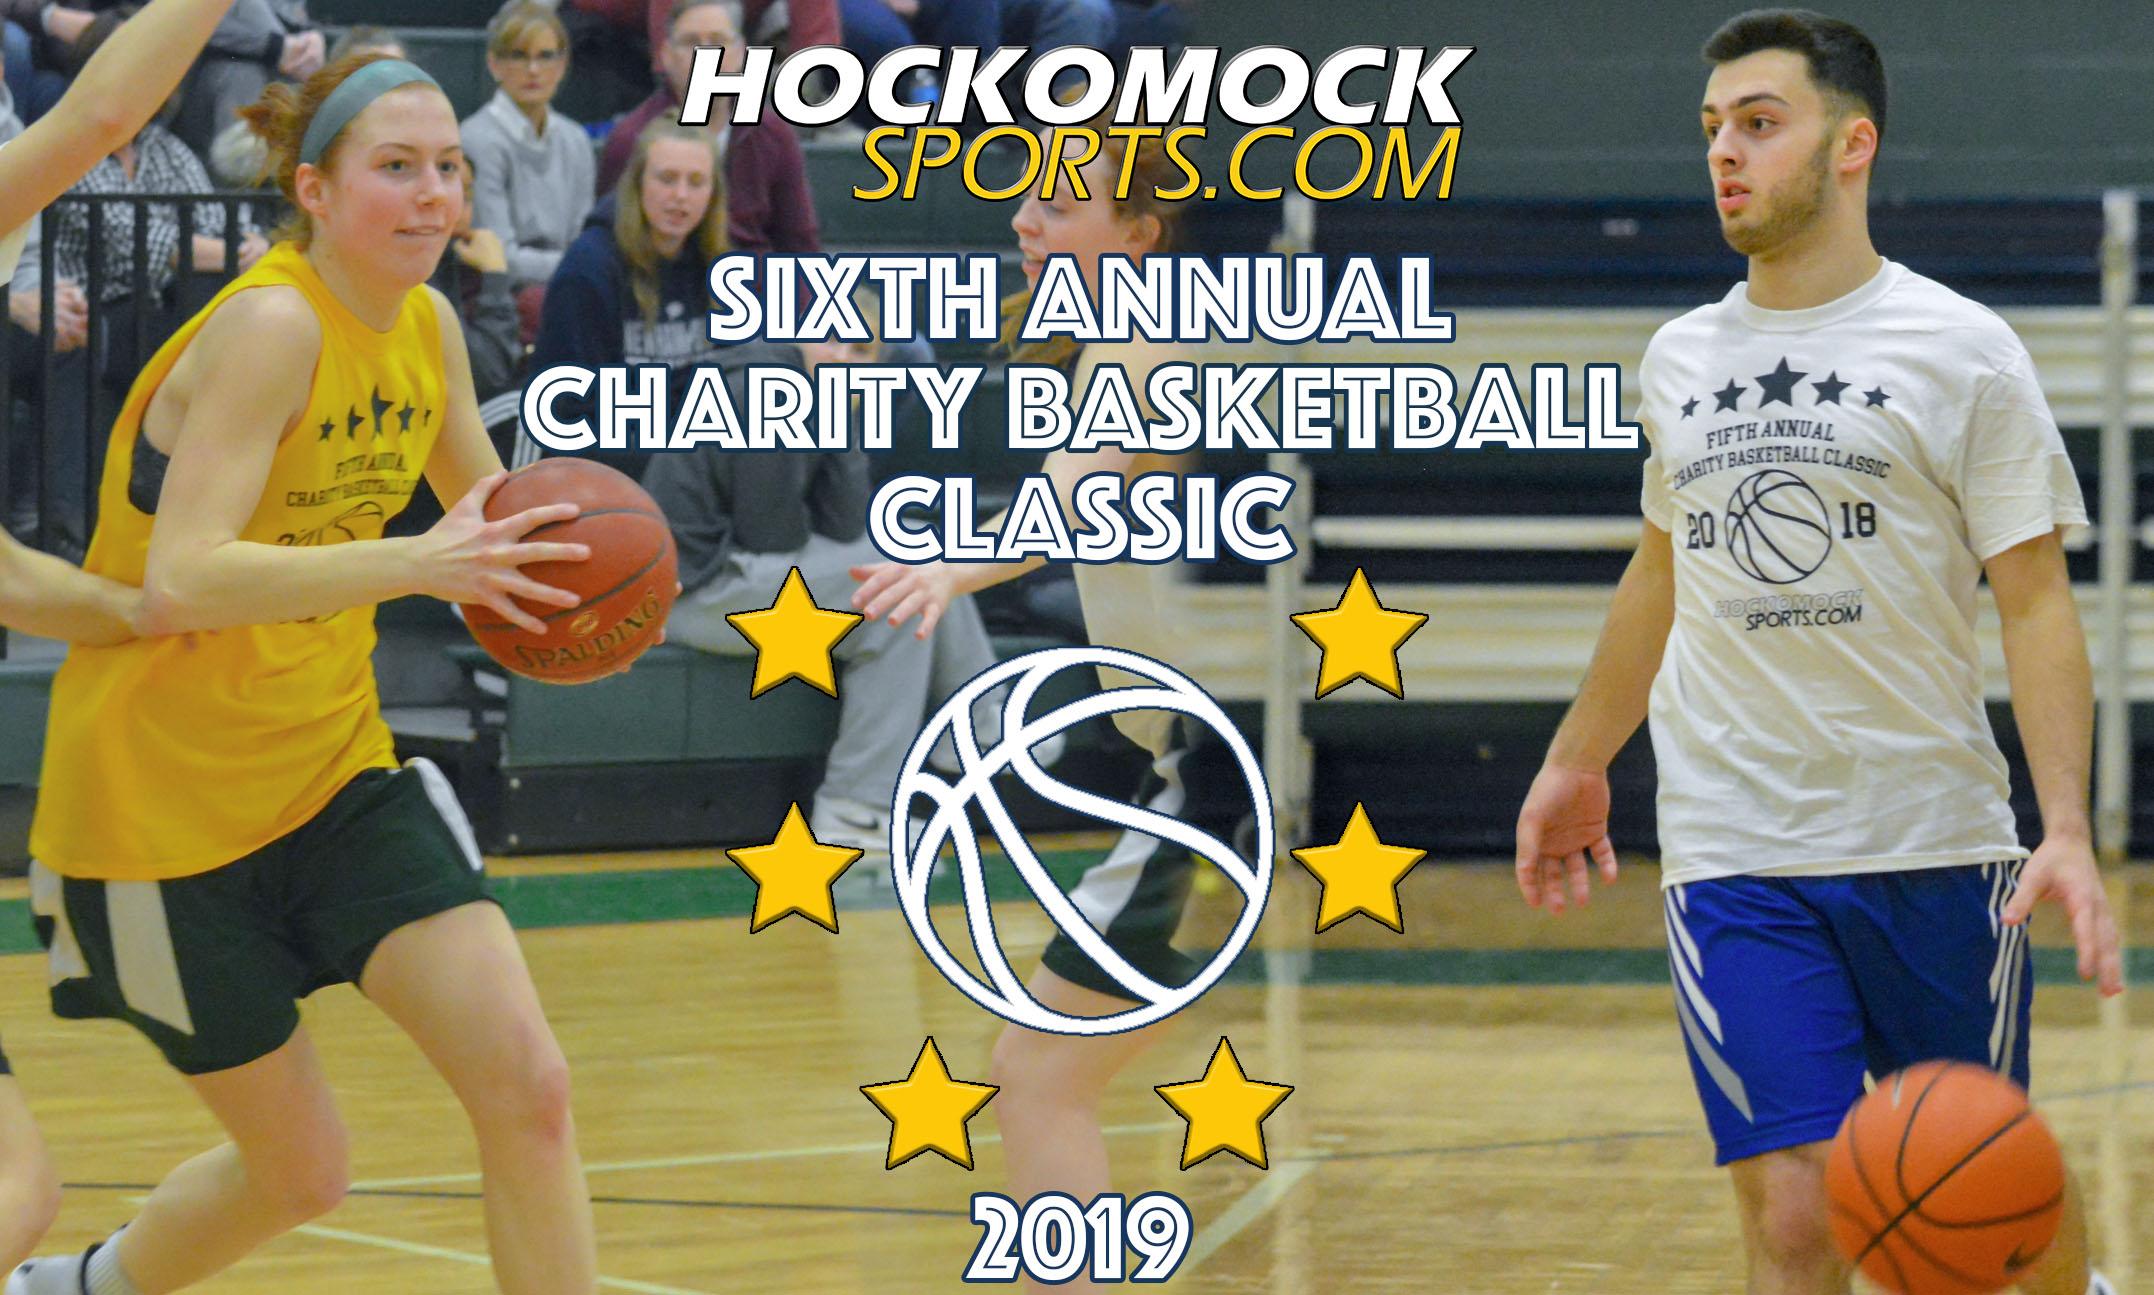 2019 Charity Basketball Classic